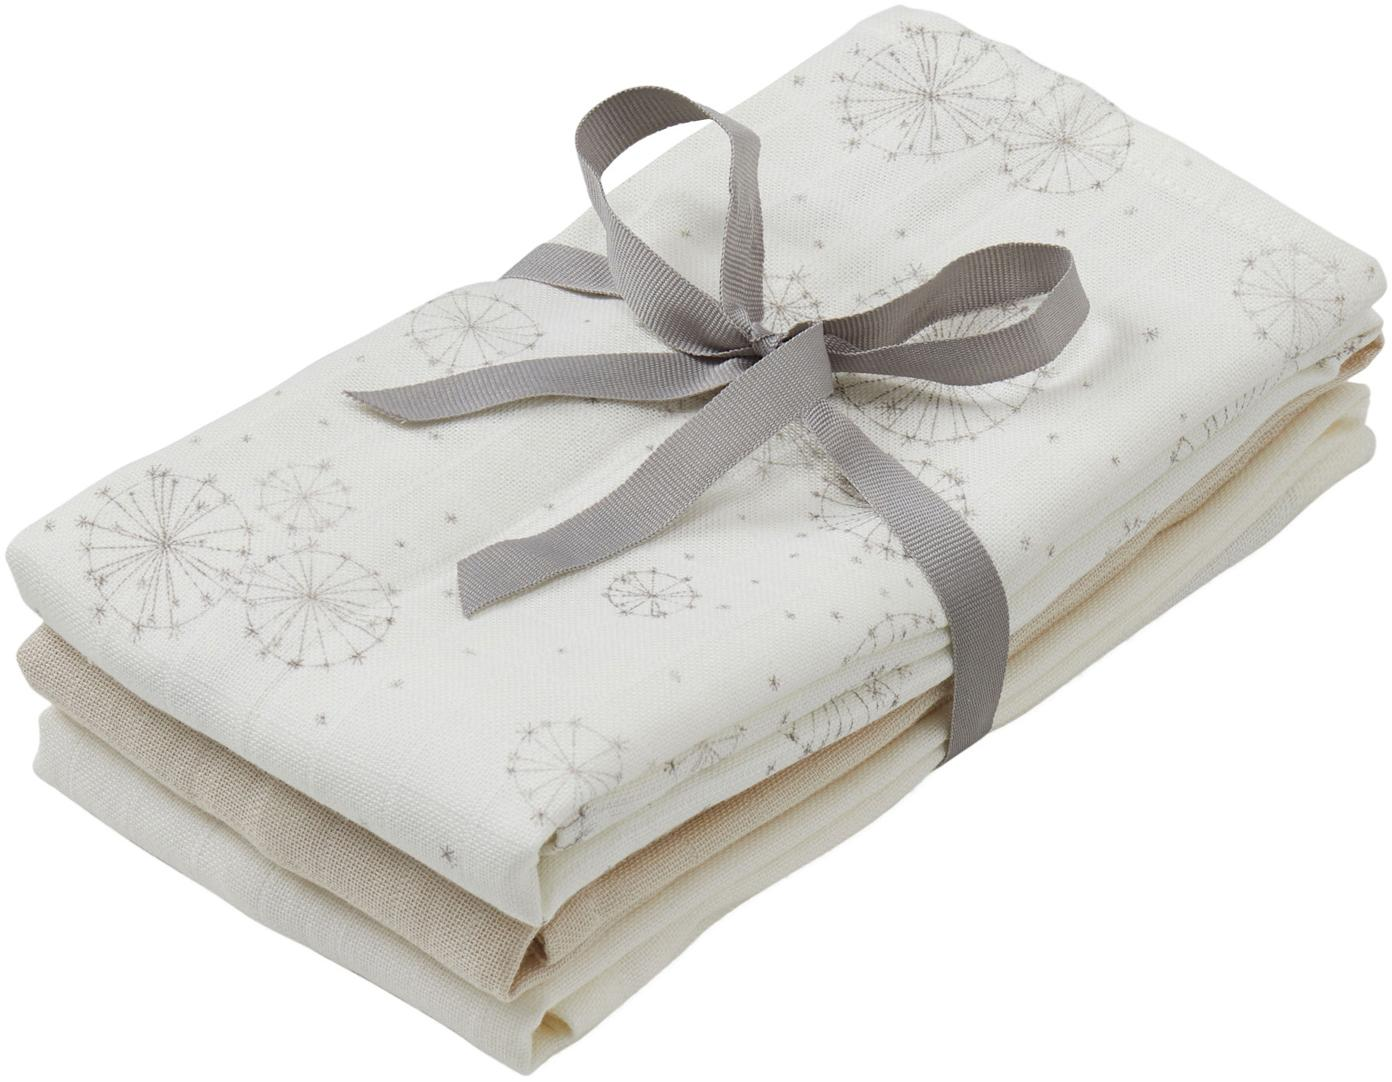 Set de pañales de tela Dandelion, 3pzas., Algodón orgánico, Blanco, beige, crema, An 70 x L 70 cm